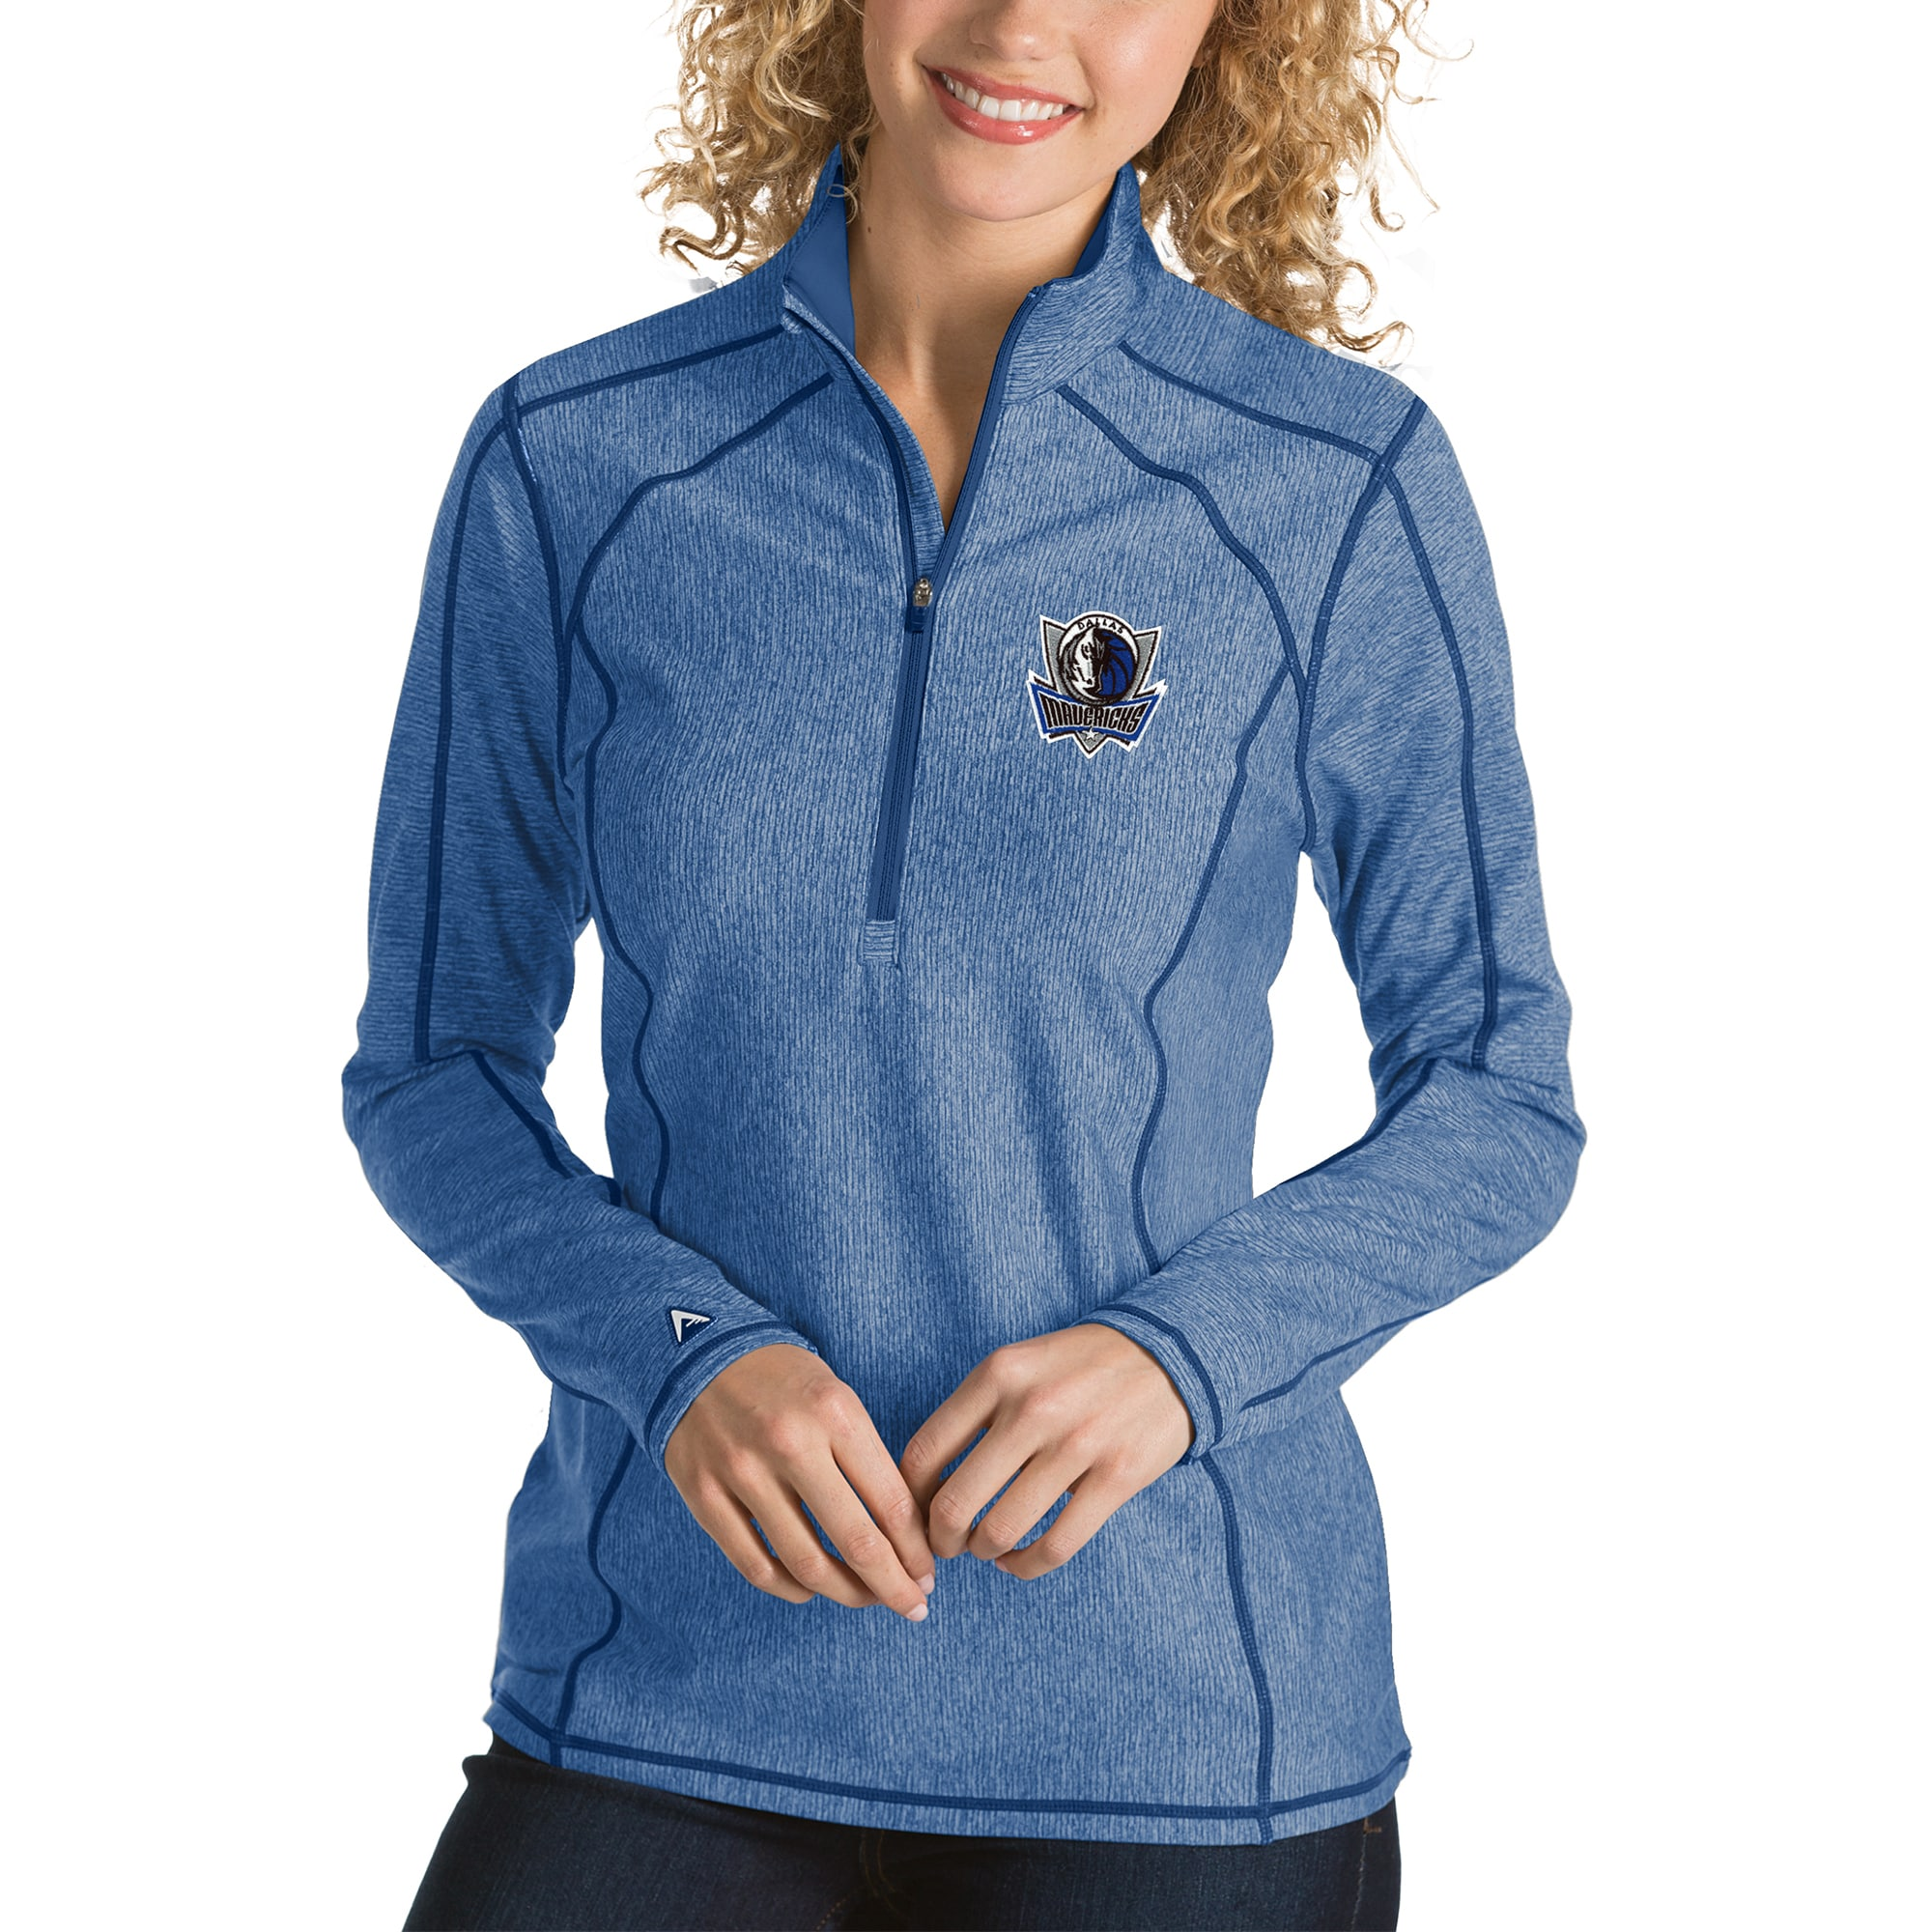 Dallas Mavericks Antigua Women's Tempo Half-Zip Pullover Jacket - Heather Royal